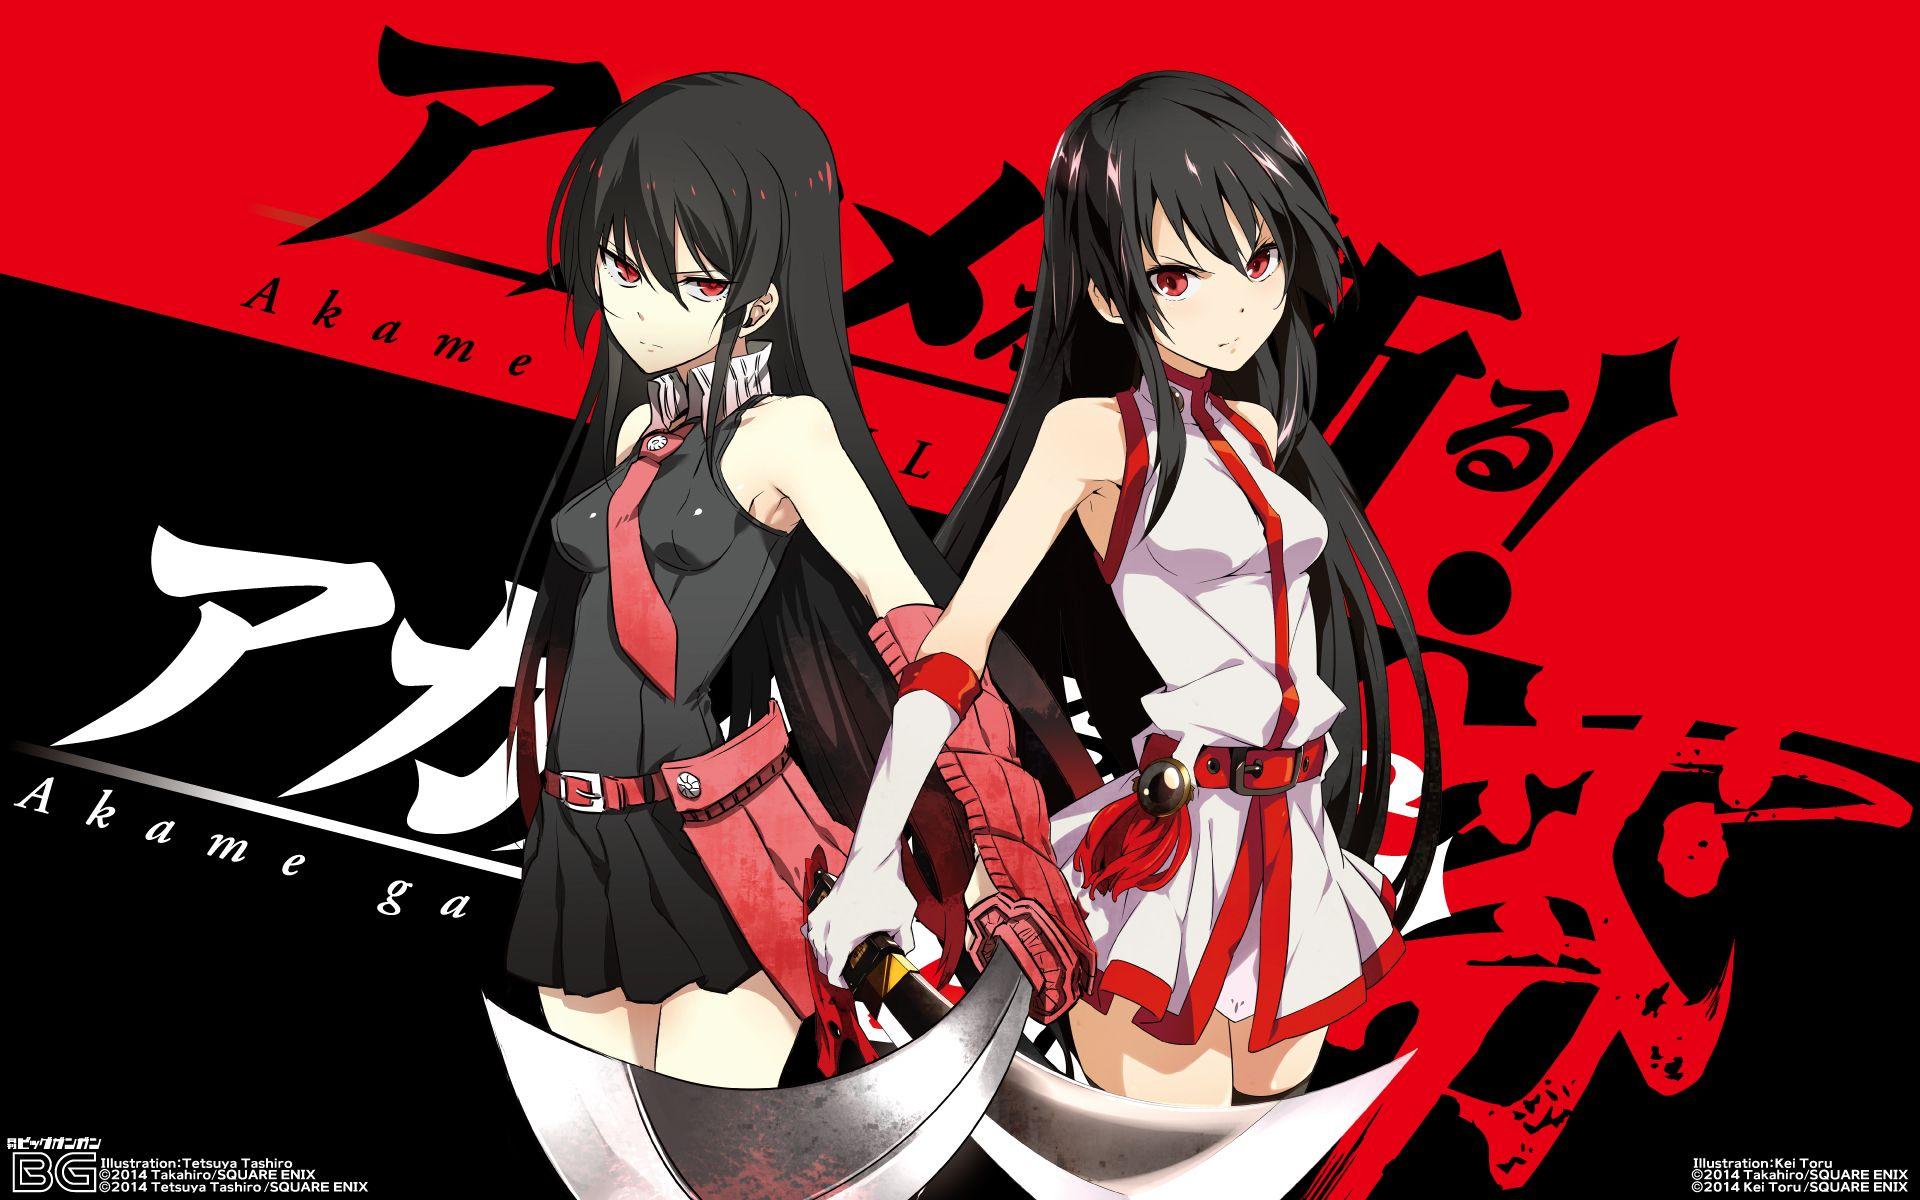 #AkamegaKill like the fanpage to see the latest episode https://www.facebook.com/AnimeSeriesHD